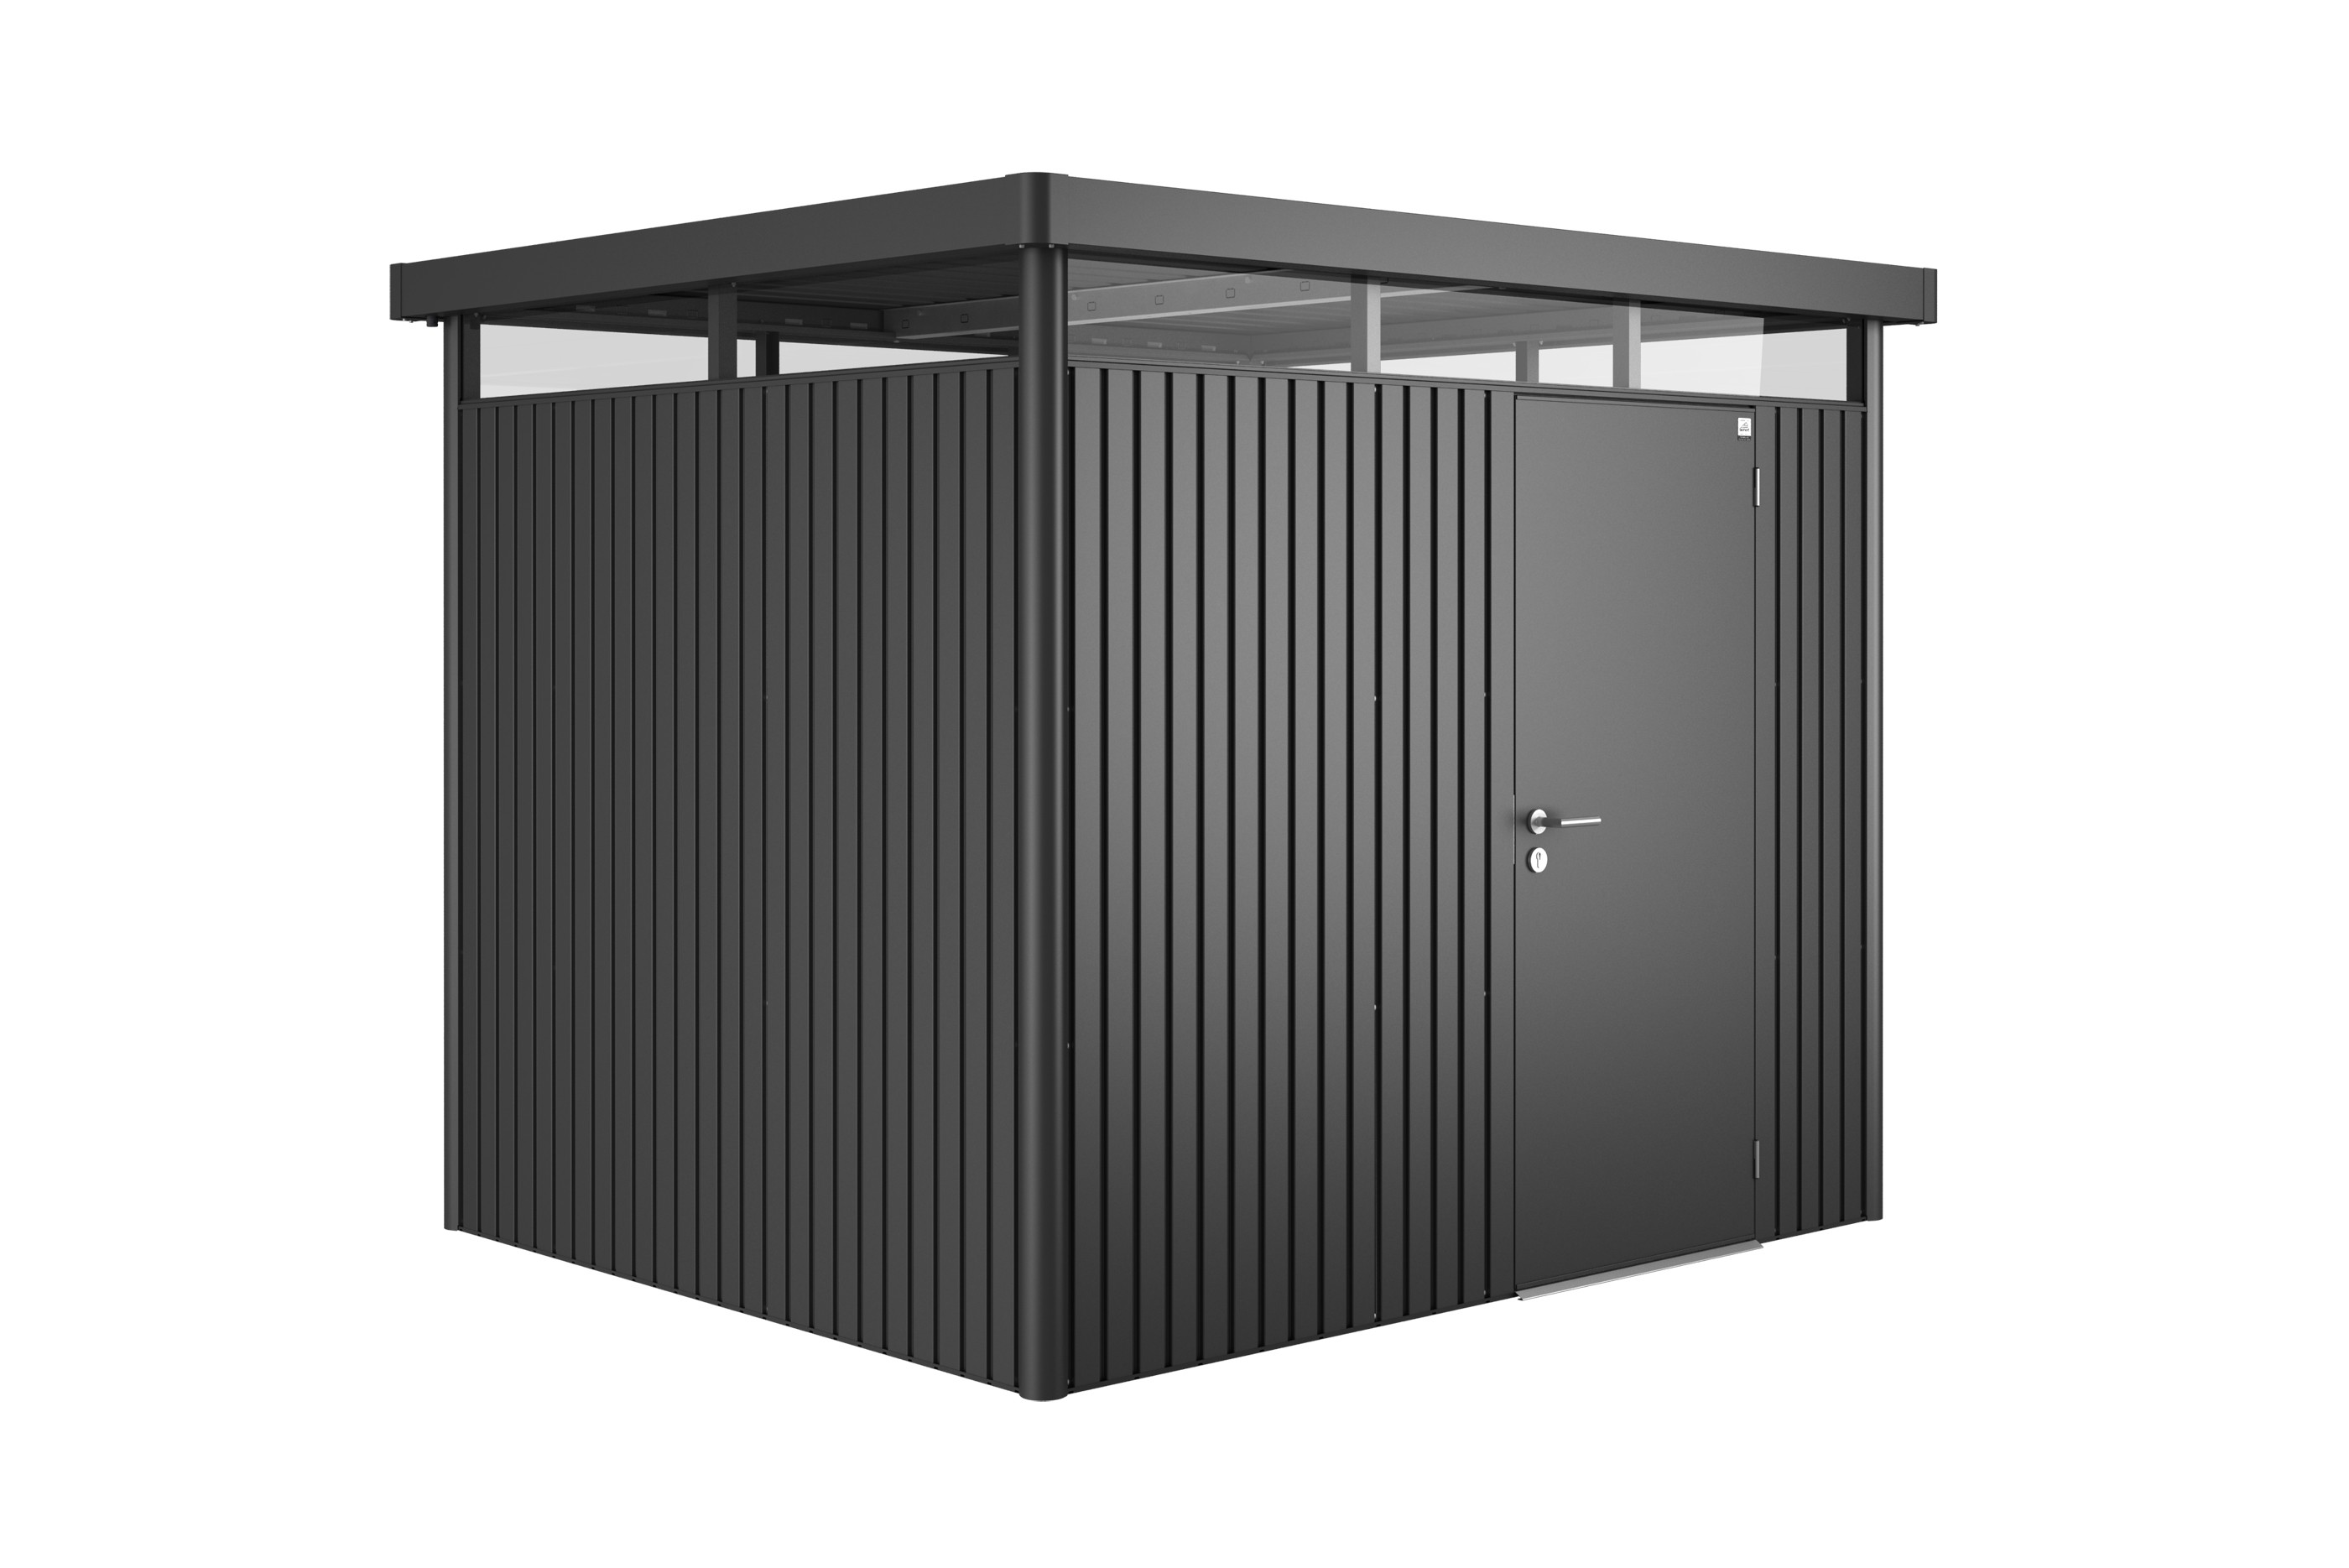 ger tehaus biohort highline h3 dunkelgrau metallic 275x235x222cm bei. Black Bedroom Furniture Sets. Home Design Ideas